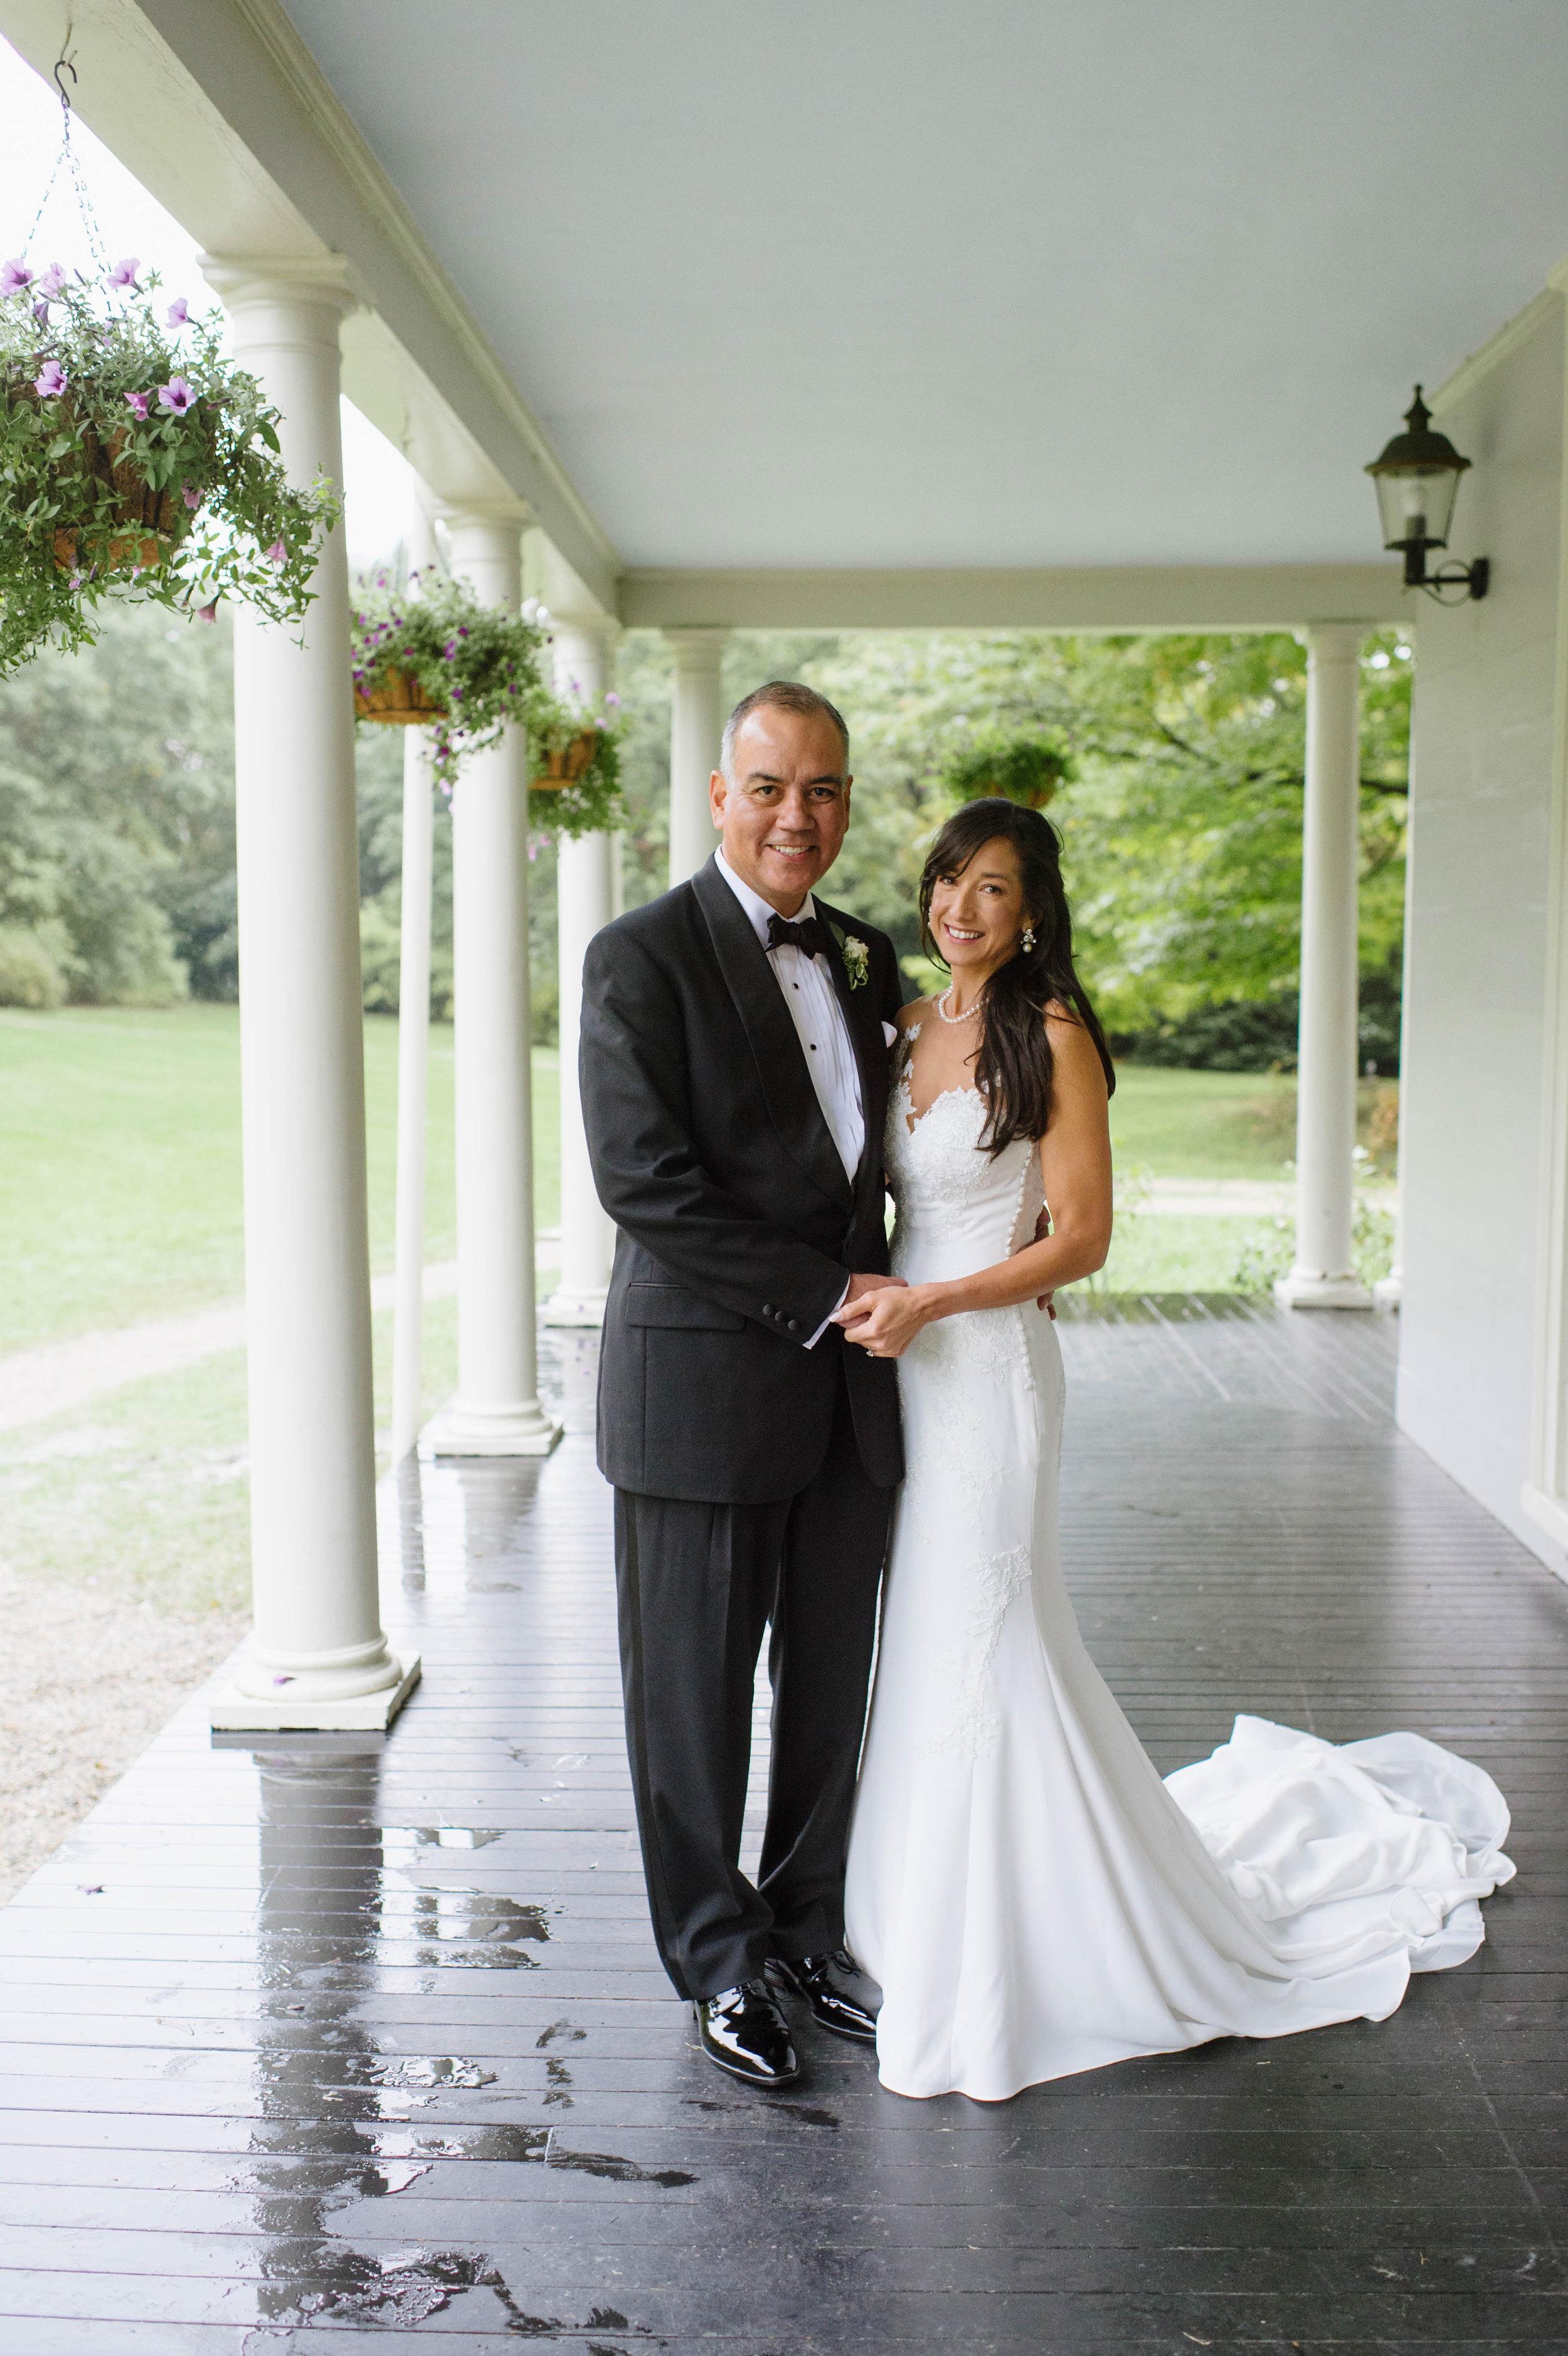 Creative-Wedding-Photography-Boston15.jpg